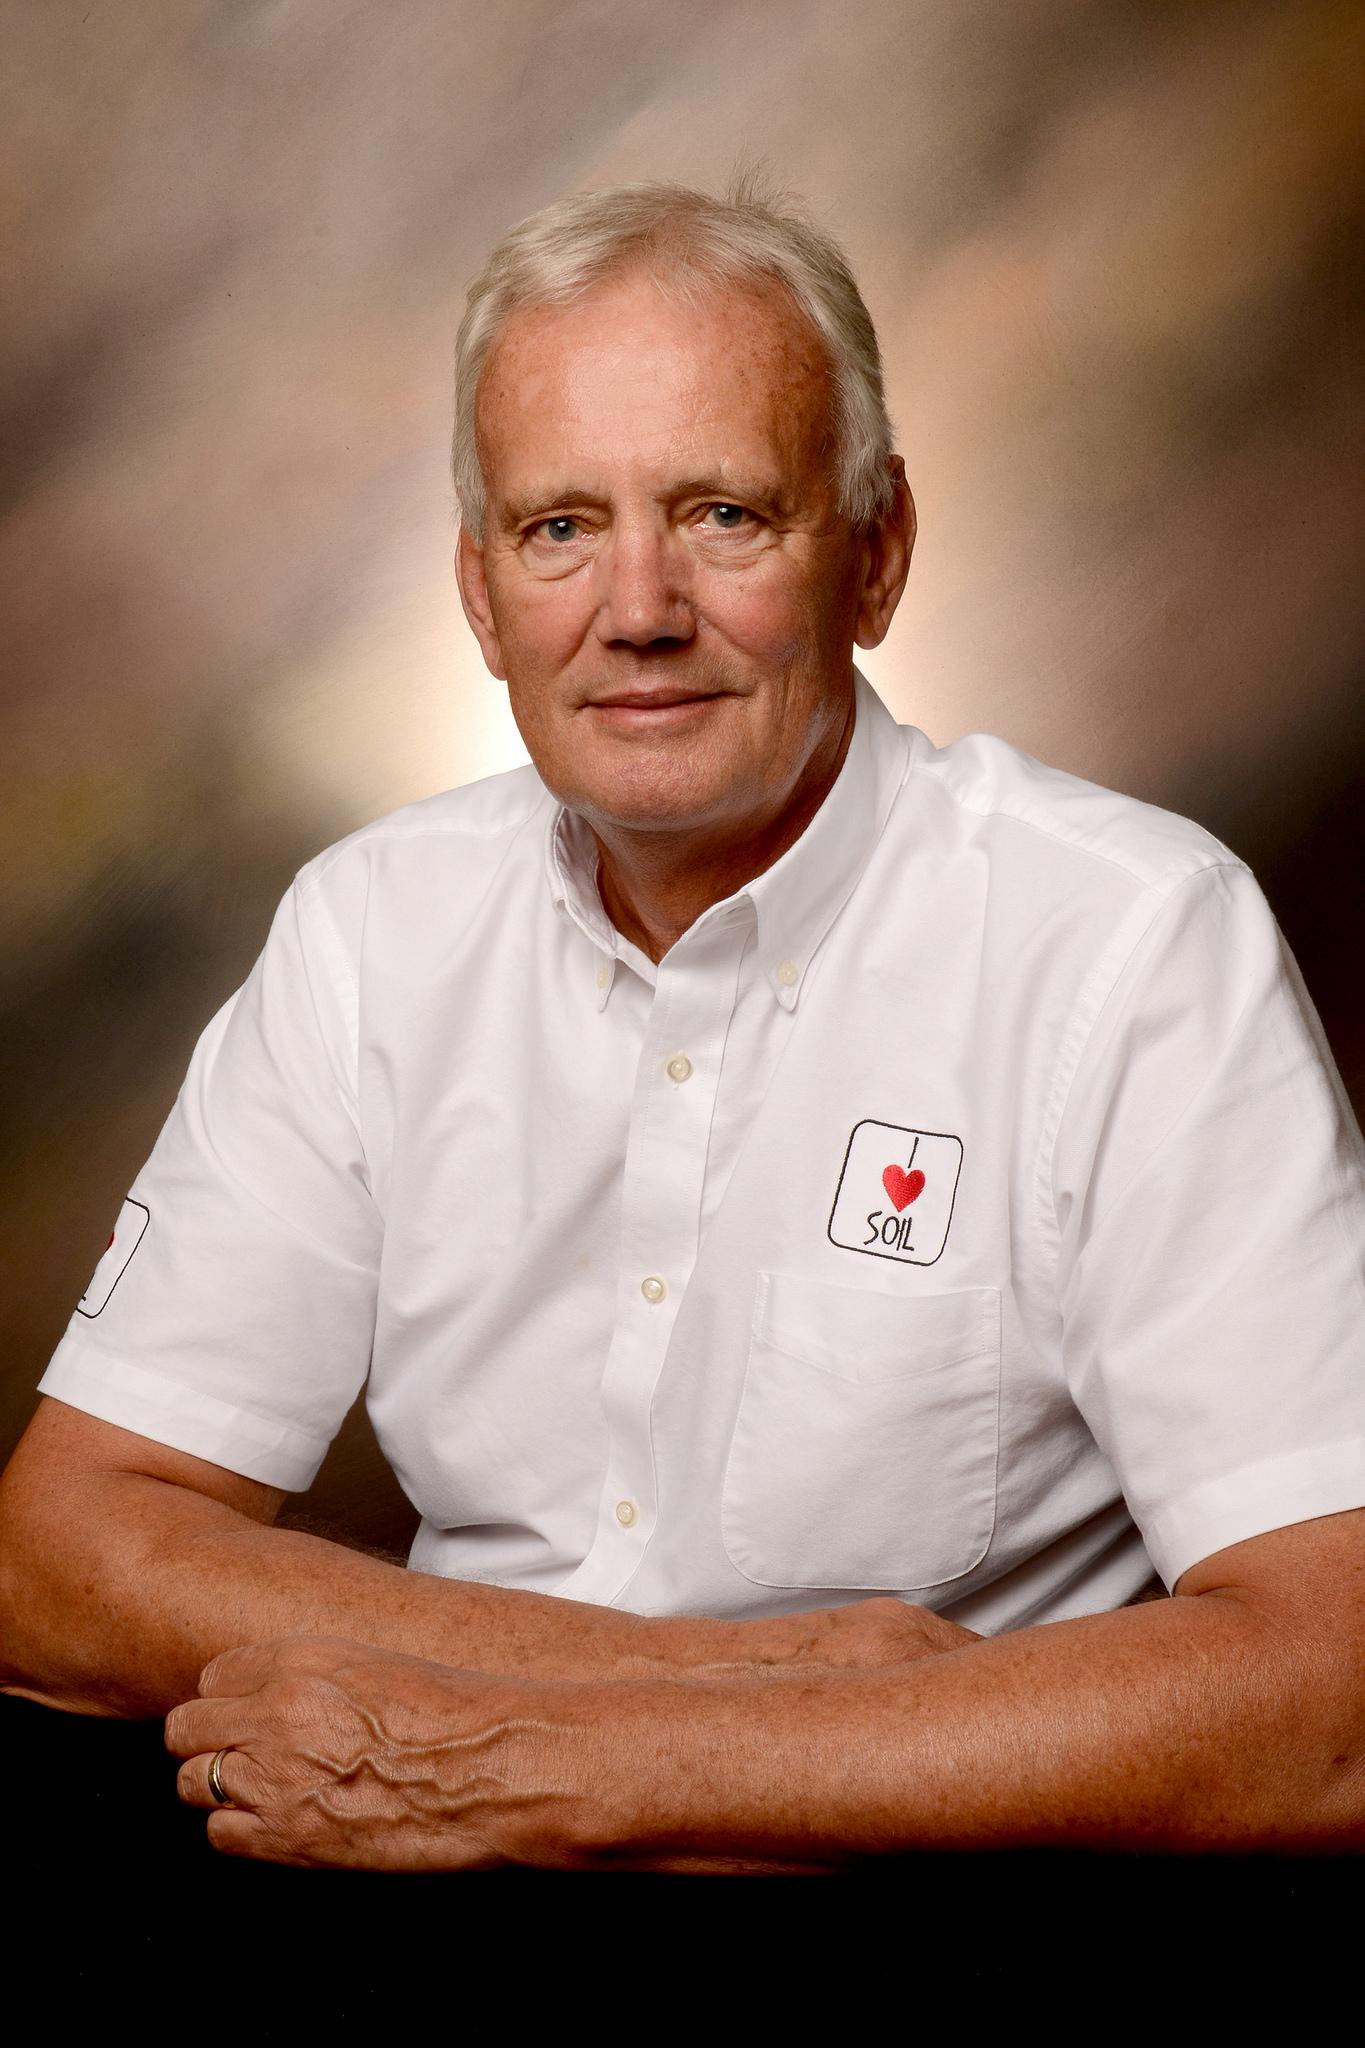 Andrew Sharpley - 2019 Norman Borlaug Award